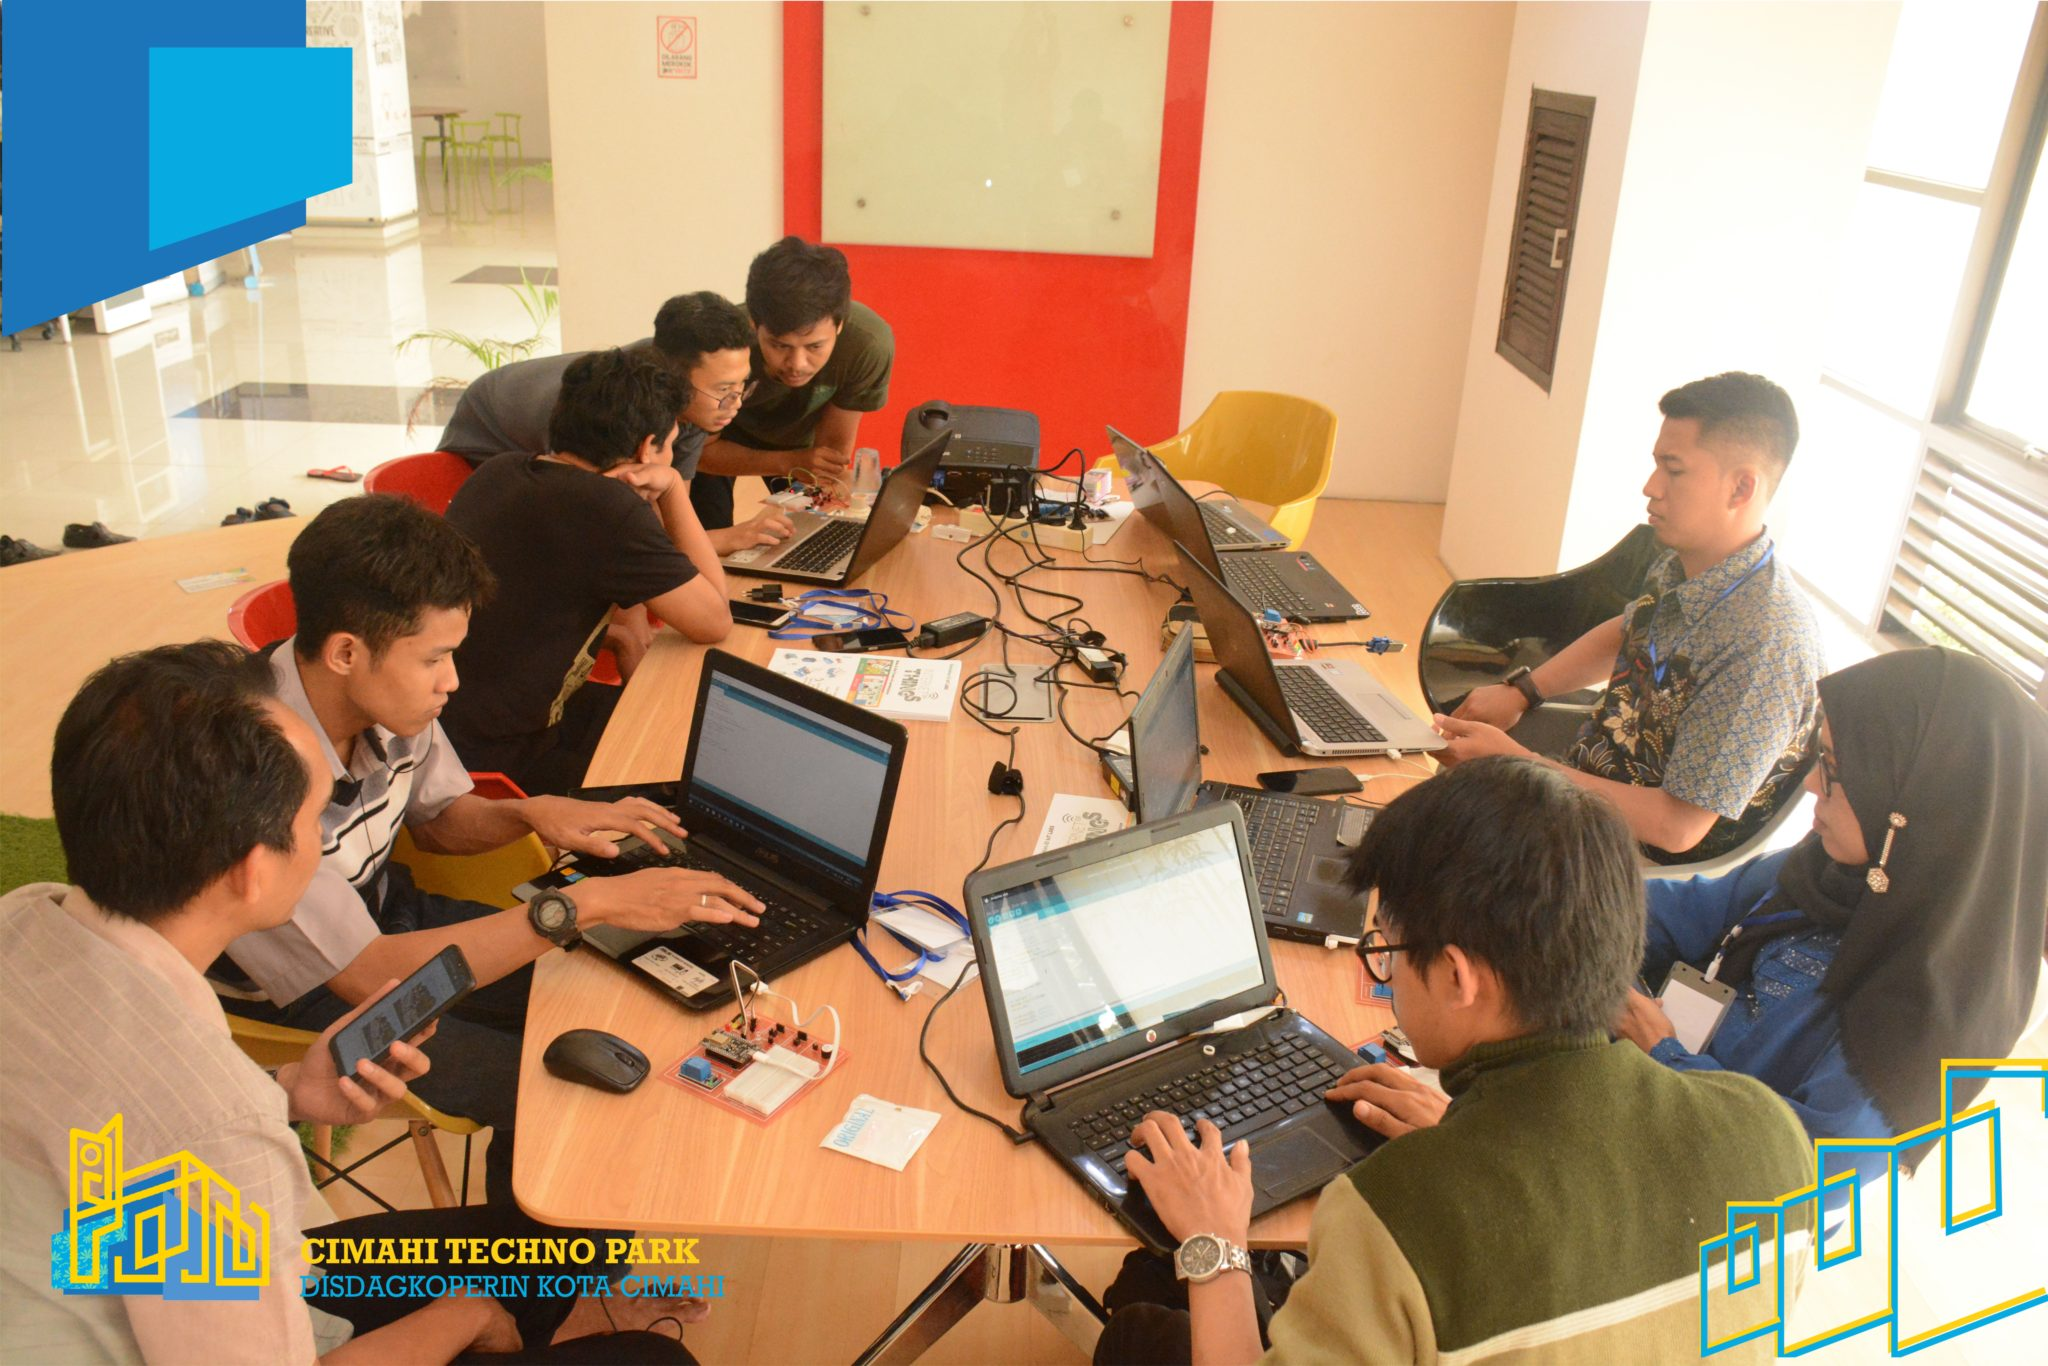 Sekolahan.id; Start Up Kota Cimahi Buat Aplikasi Inovasi